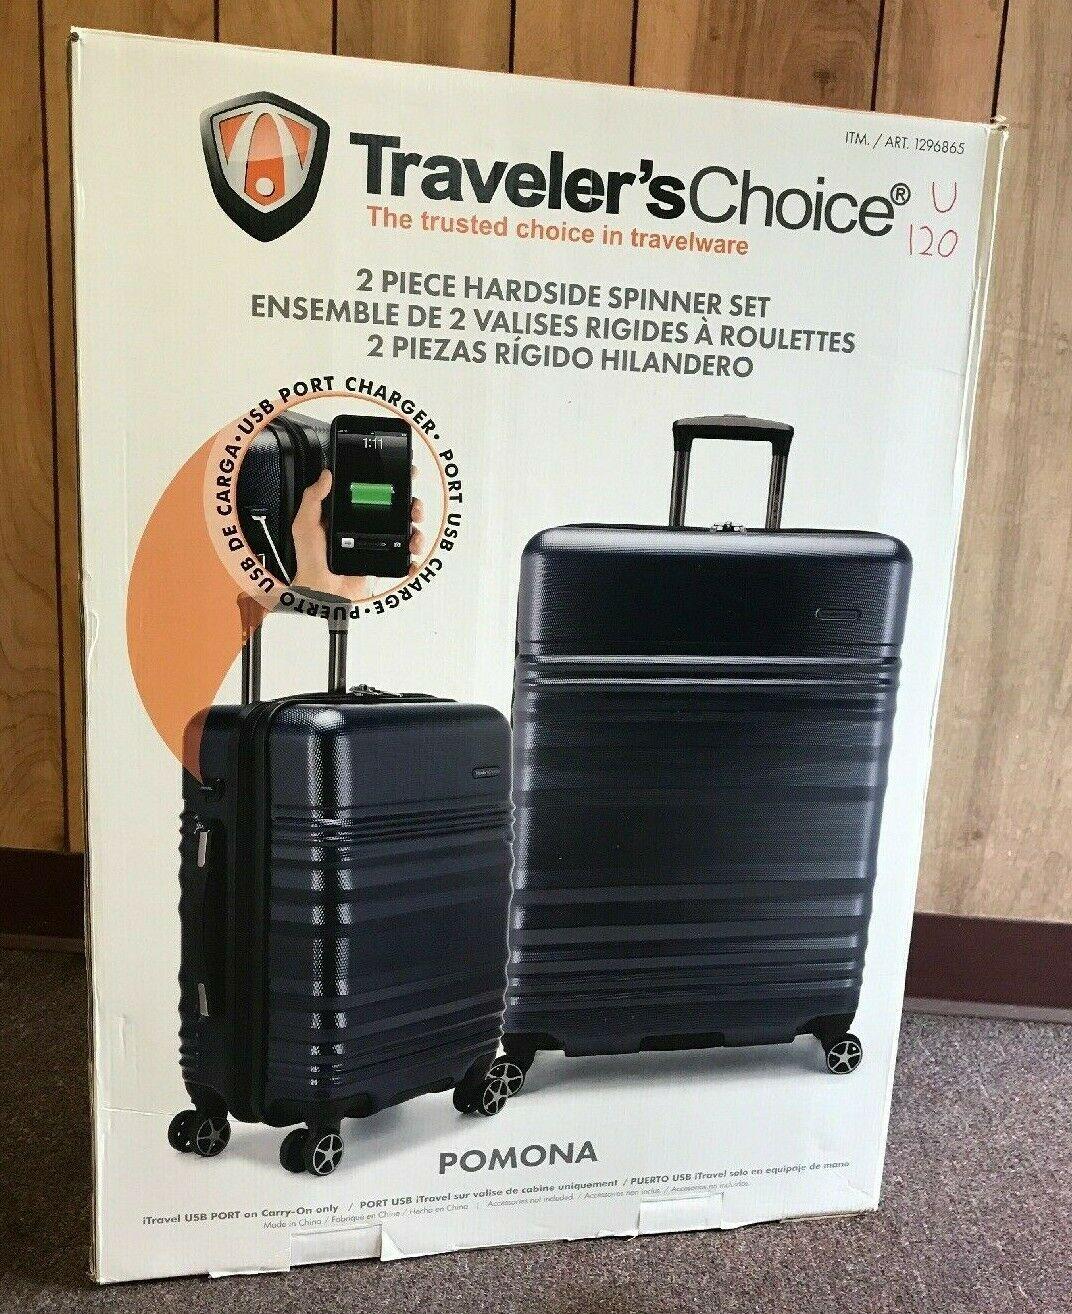 Travelers Choice Halow 3-piece Hardside Spinner Set gray